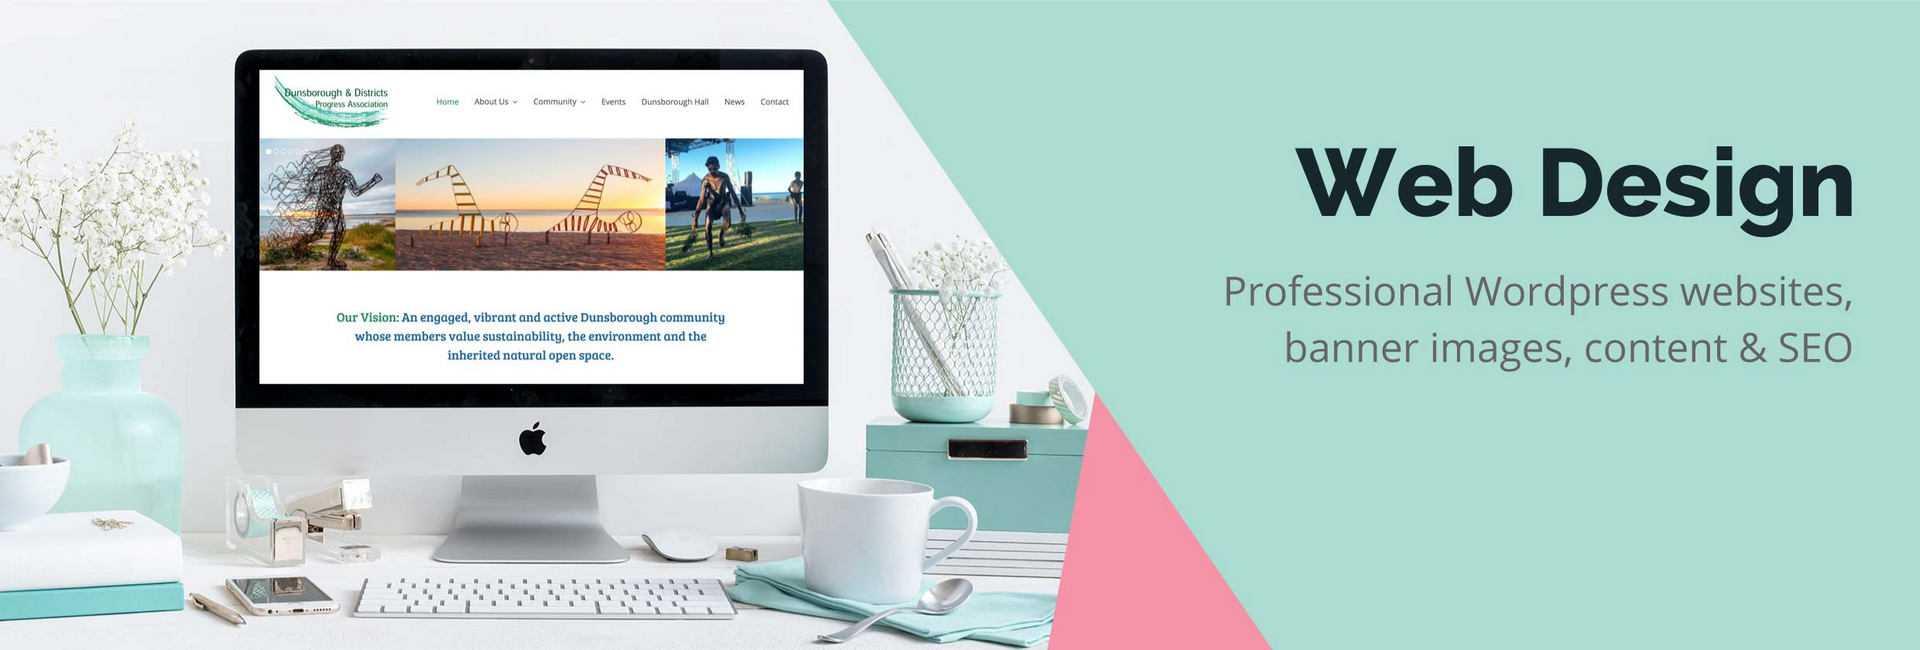 Website Package Pricing Web Design Kuala Lumpur Malaysia